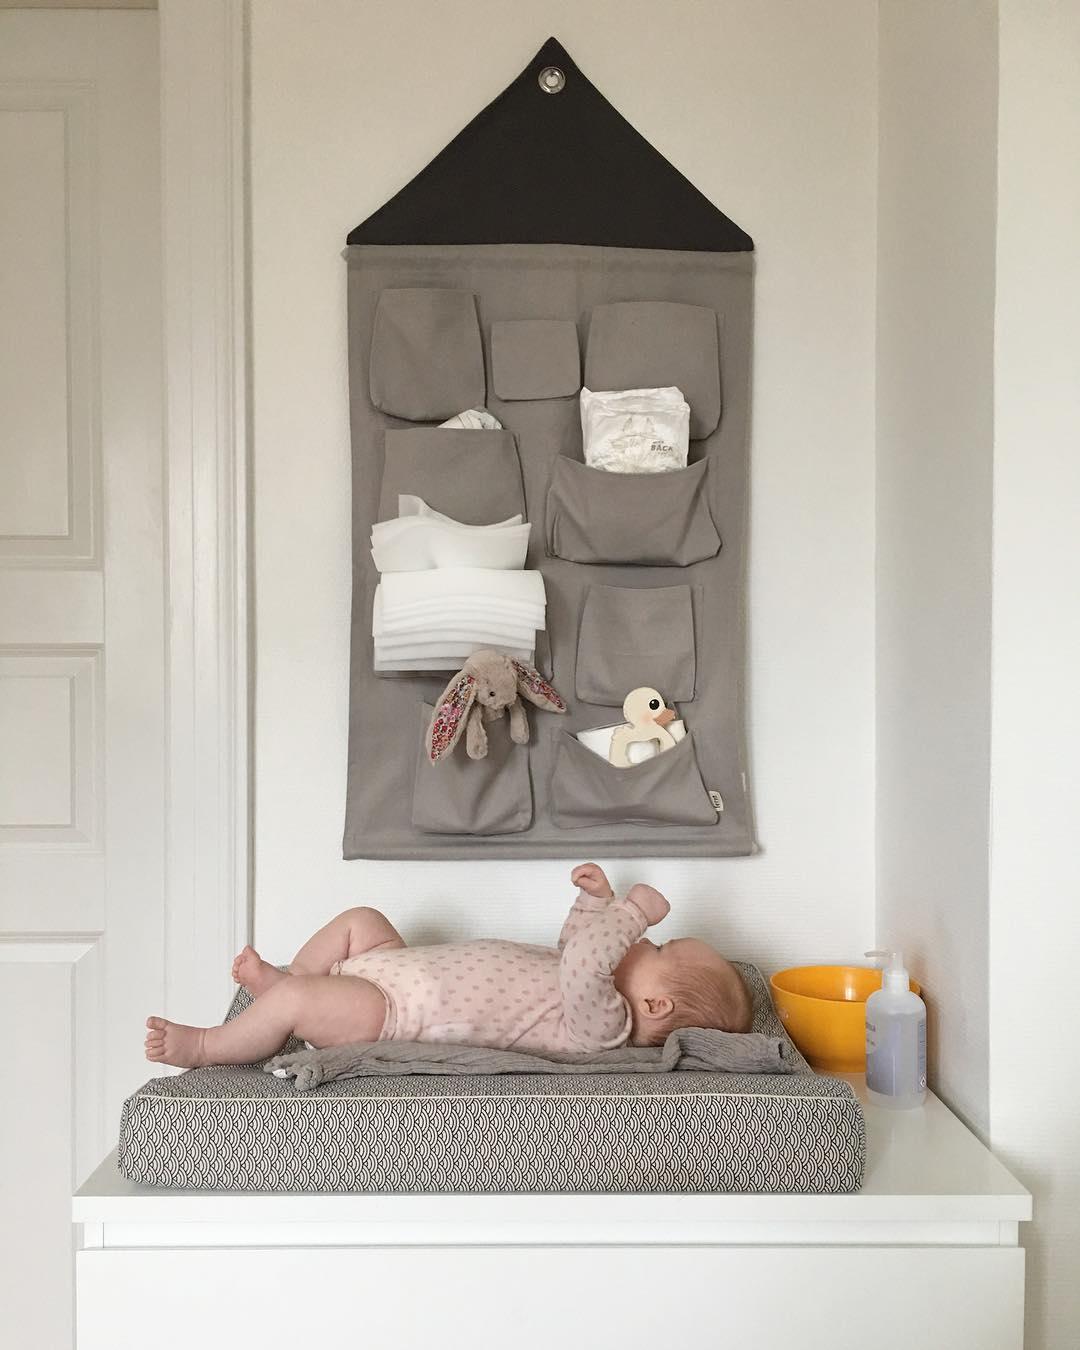 ferm-LIVING-House-Wall-Storage-https-www-fermliving-com-webshop-shop-kids-room-kids-wall-decorati-wallpaper-wp5007400